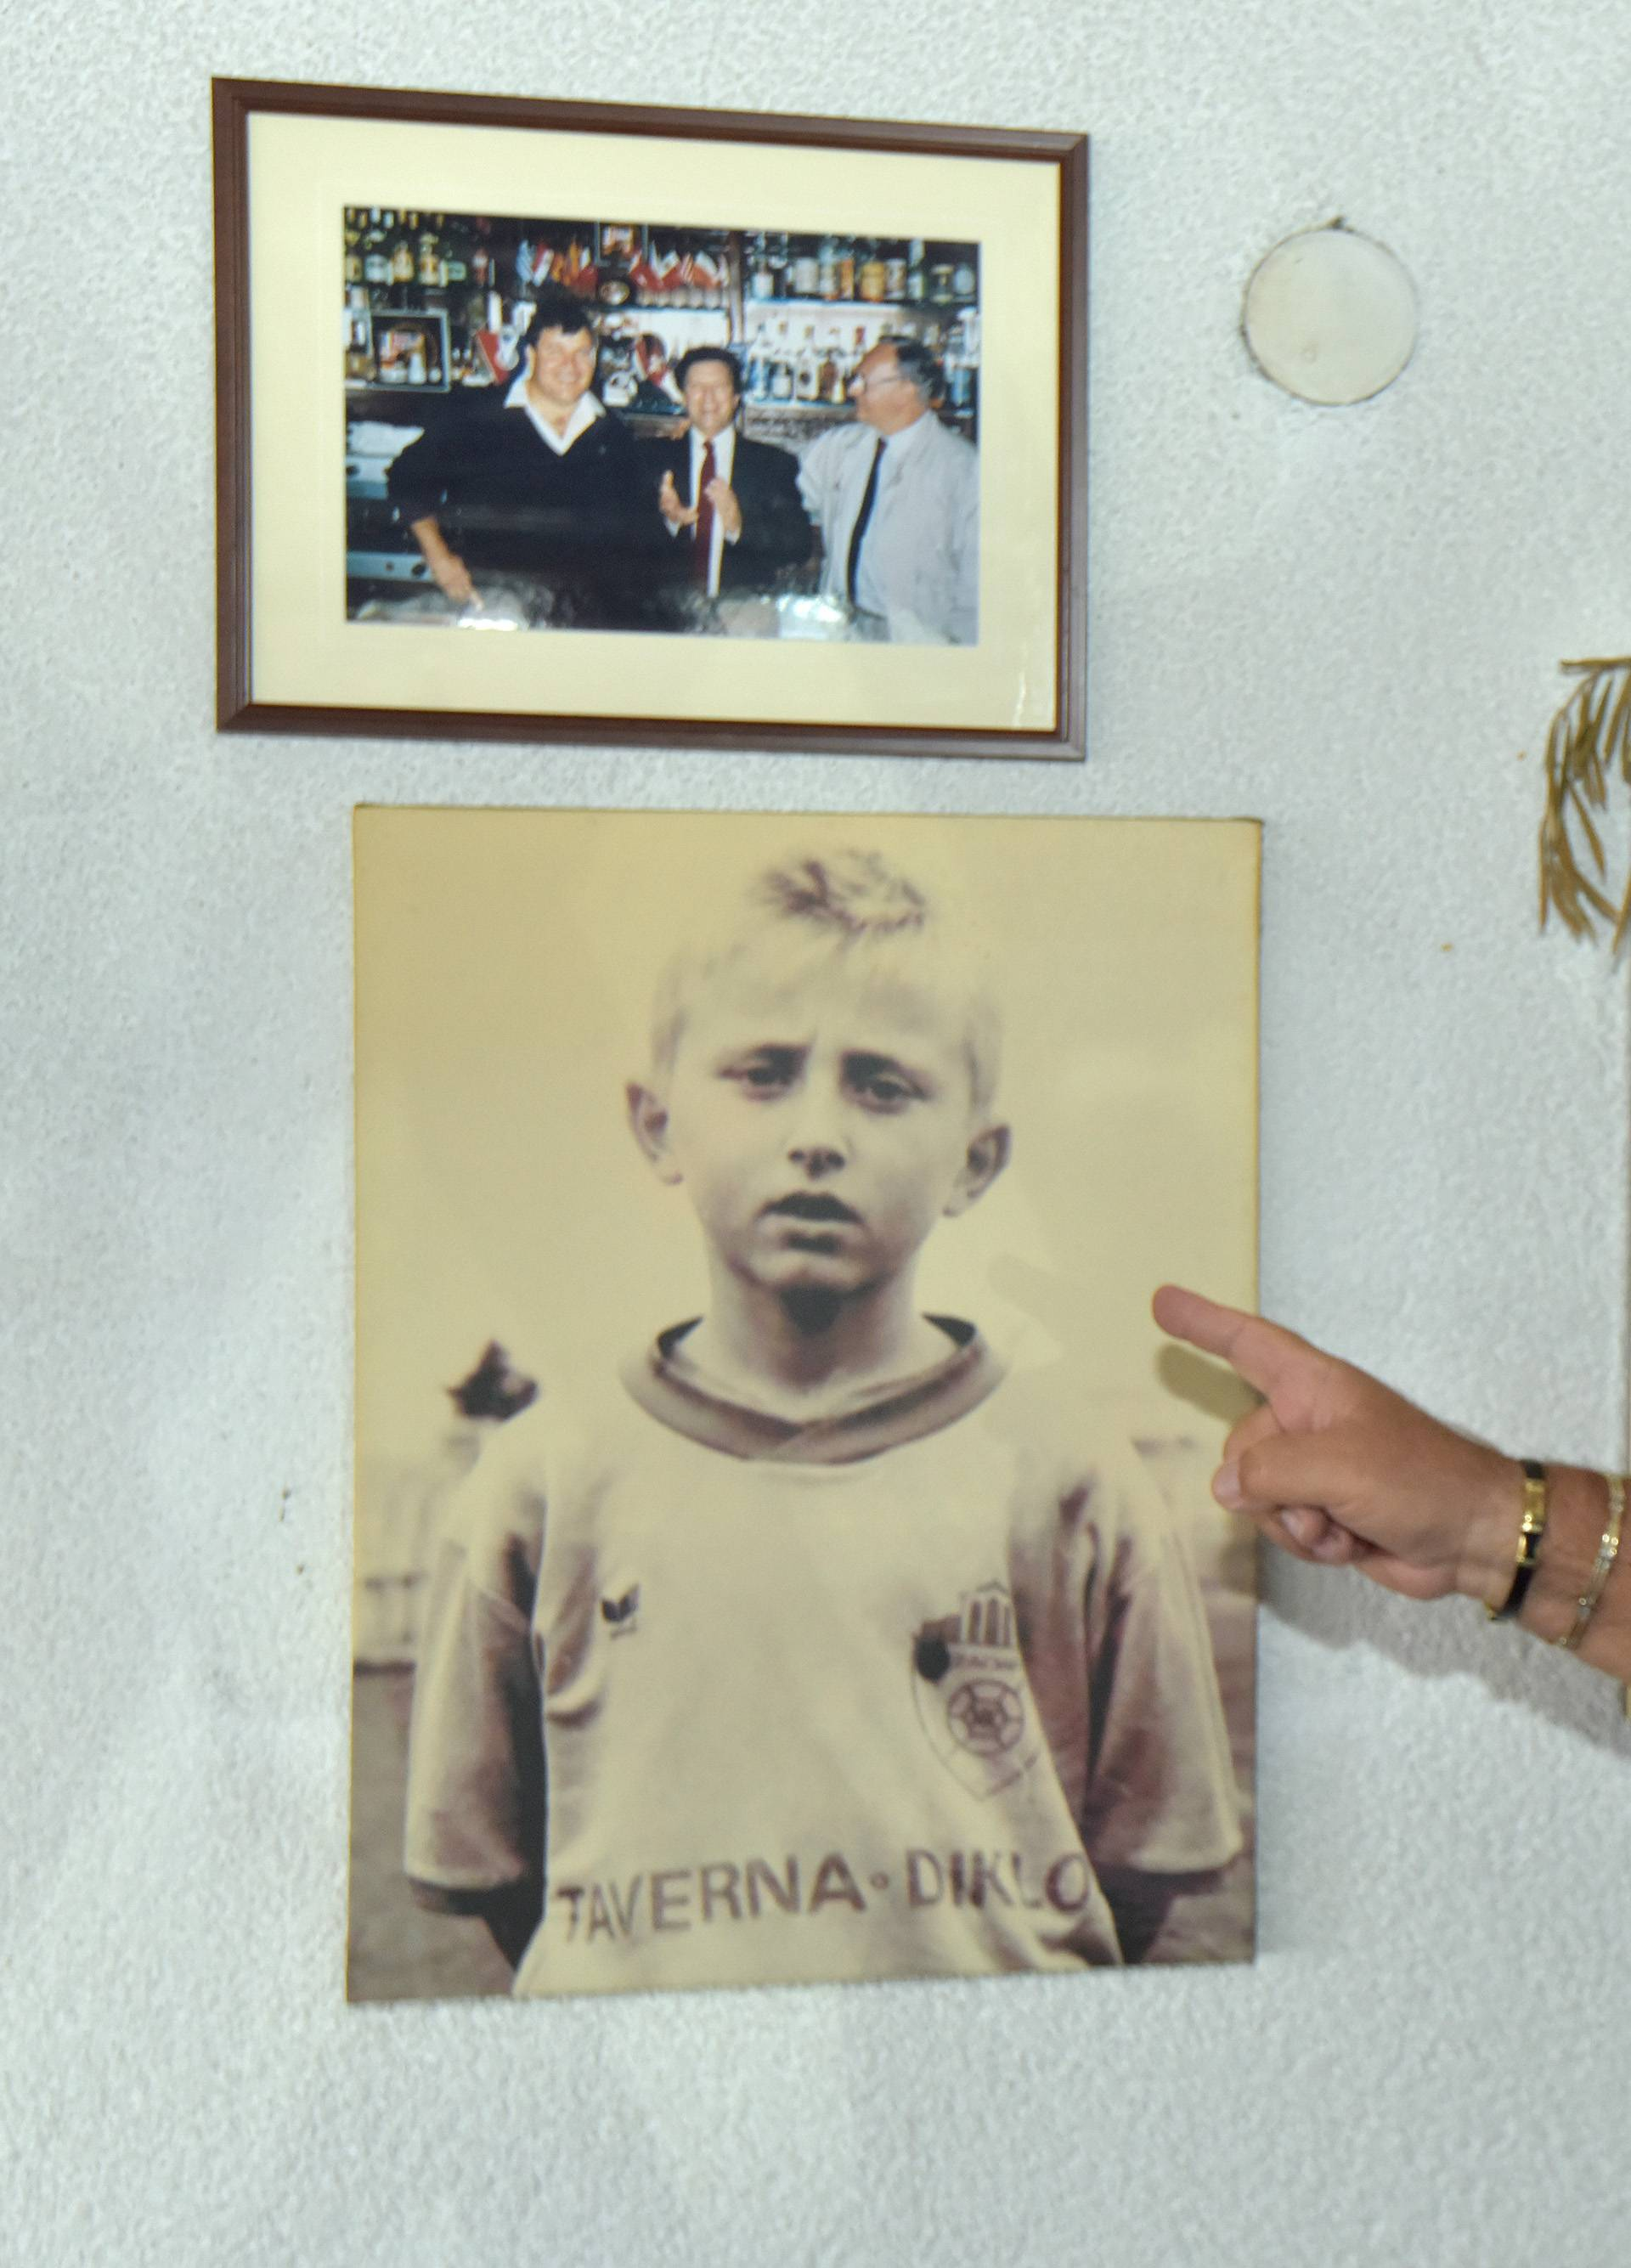 Darovao slavni Modrićev dres: Moj najbolji marketinški potez